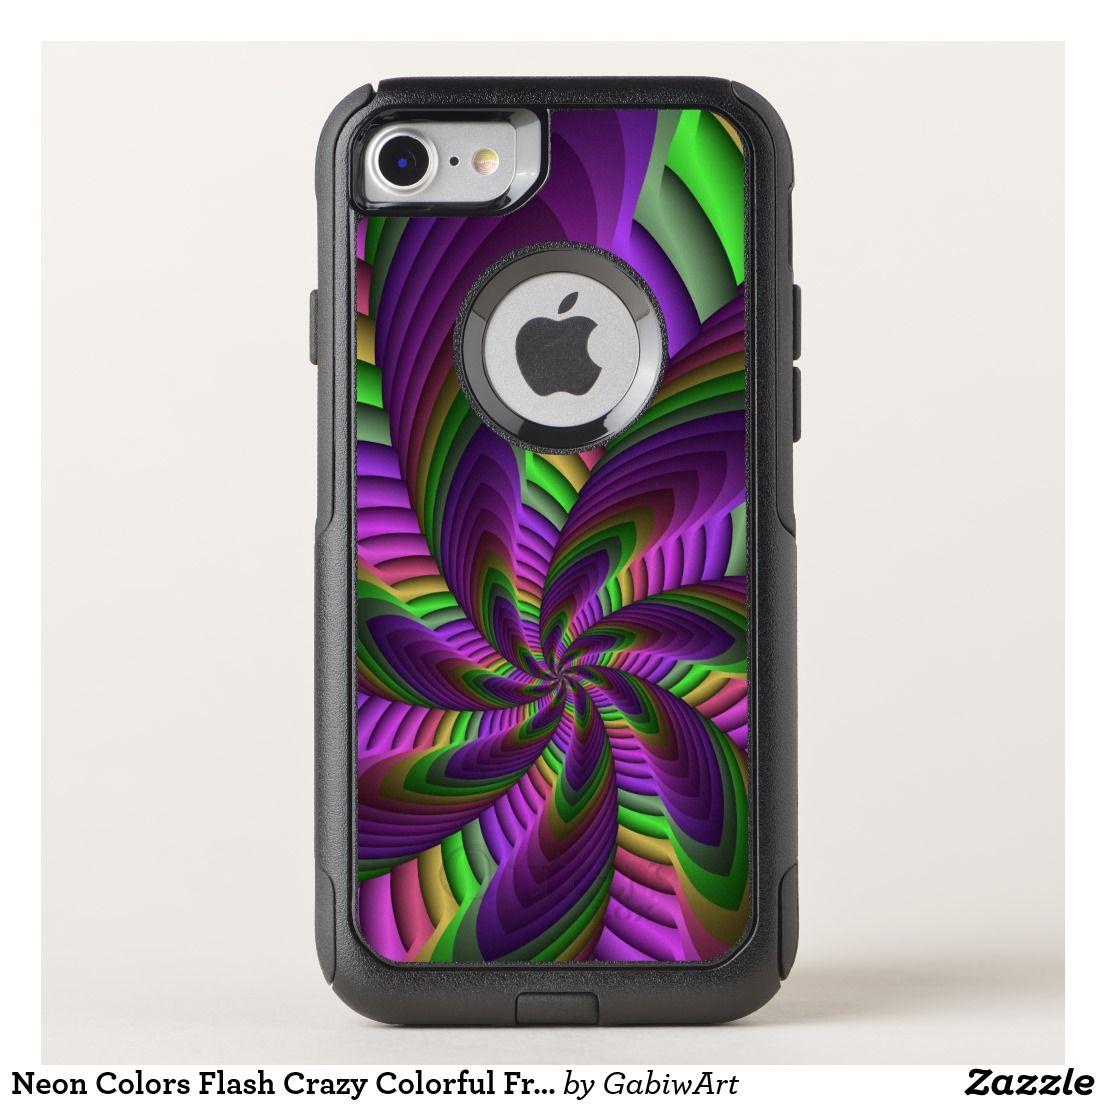 Neon colors flash crazy colorful fractal pattern otterbox